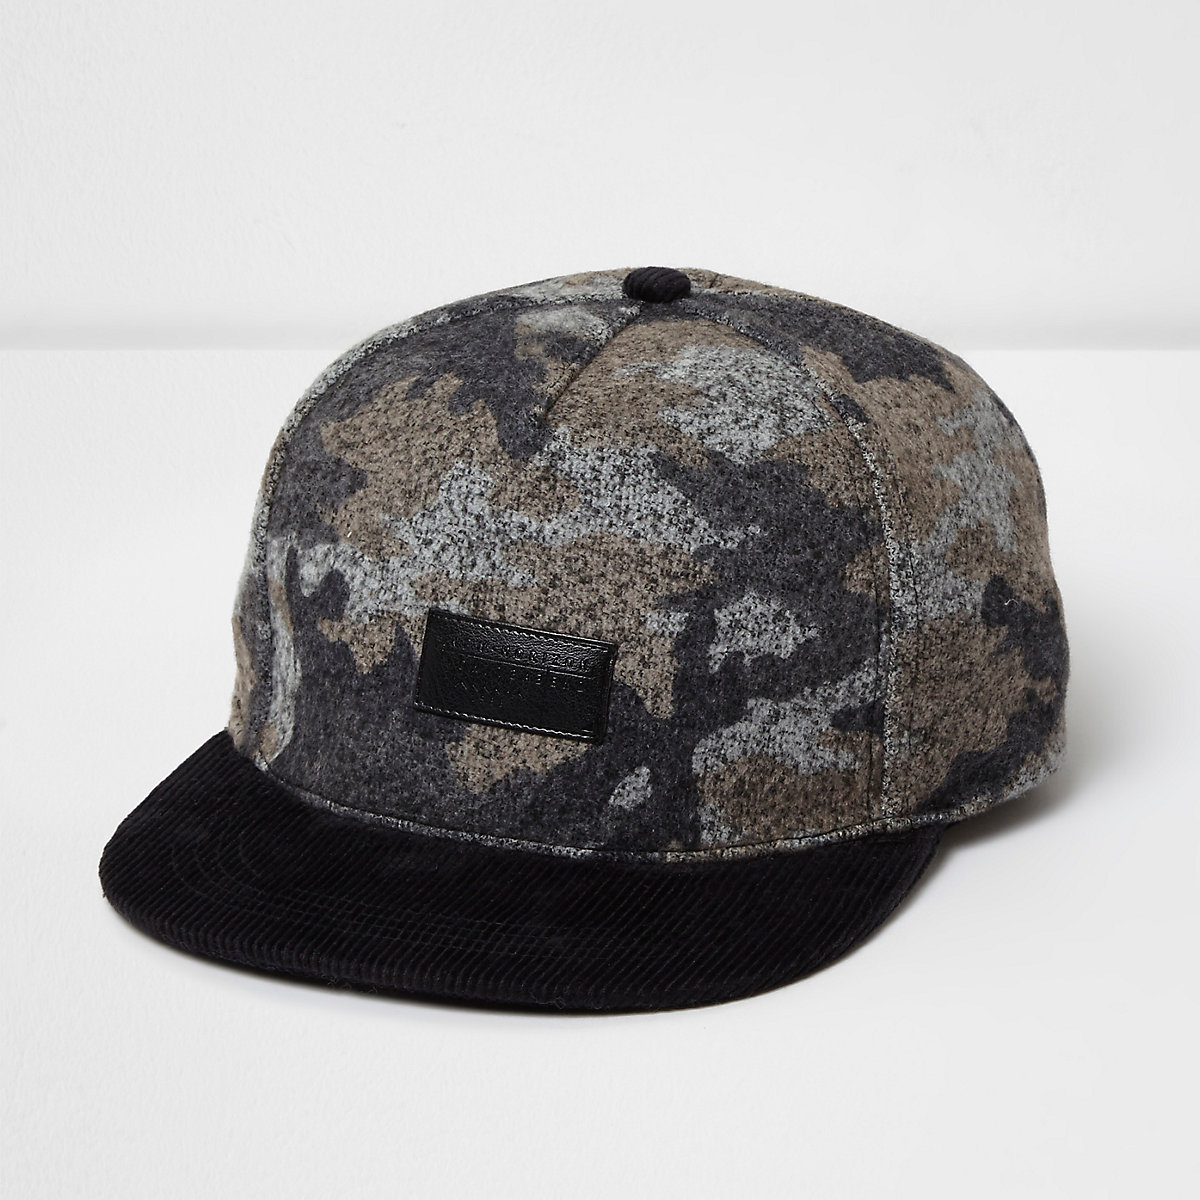 Black camo print flat corduroy peak cap - Hats   Caps - Accessories - men 3ce72bf16cc8